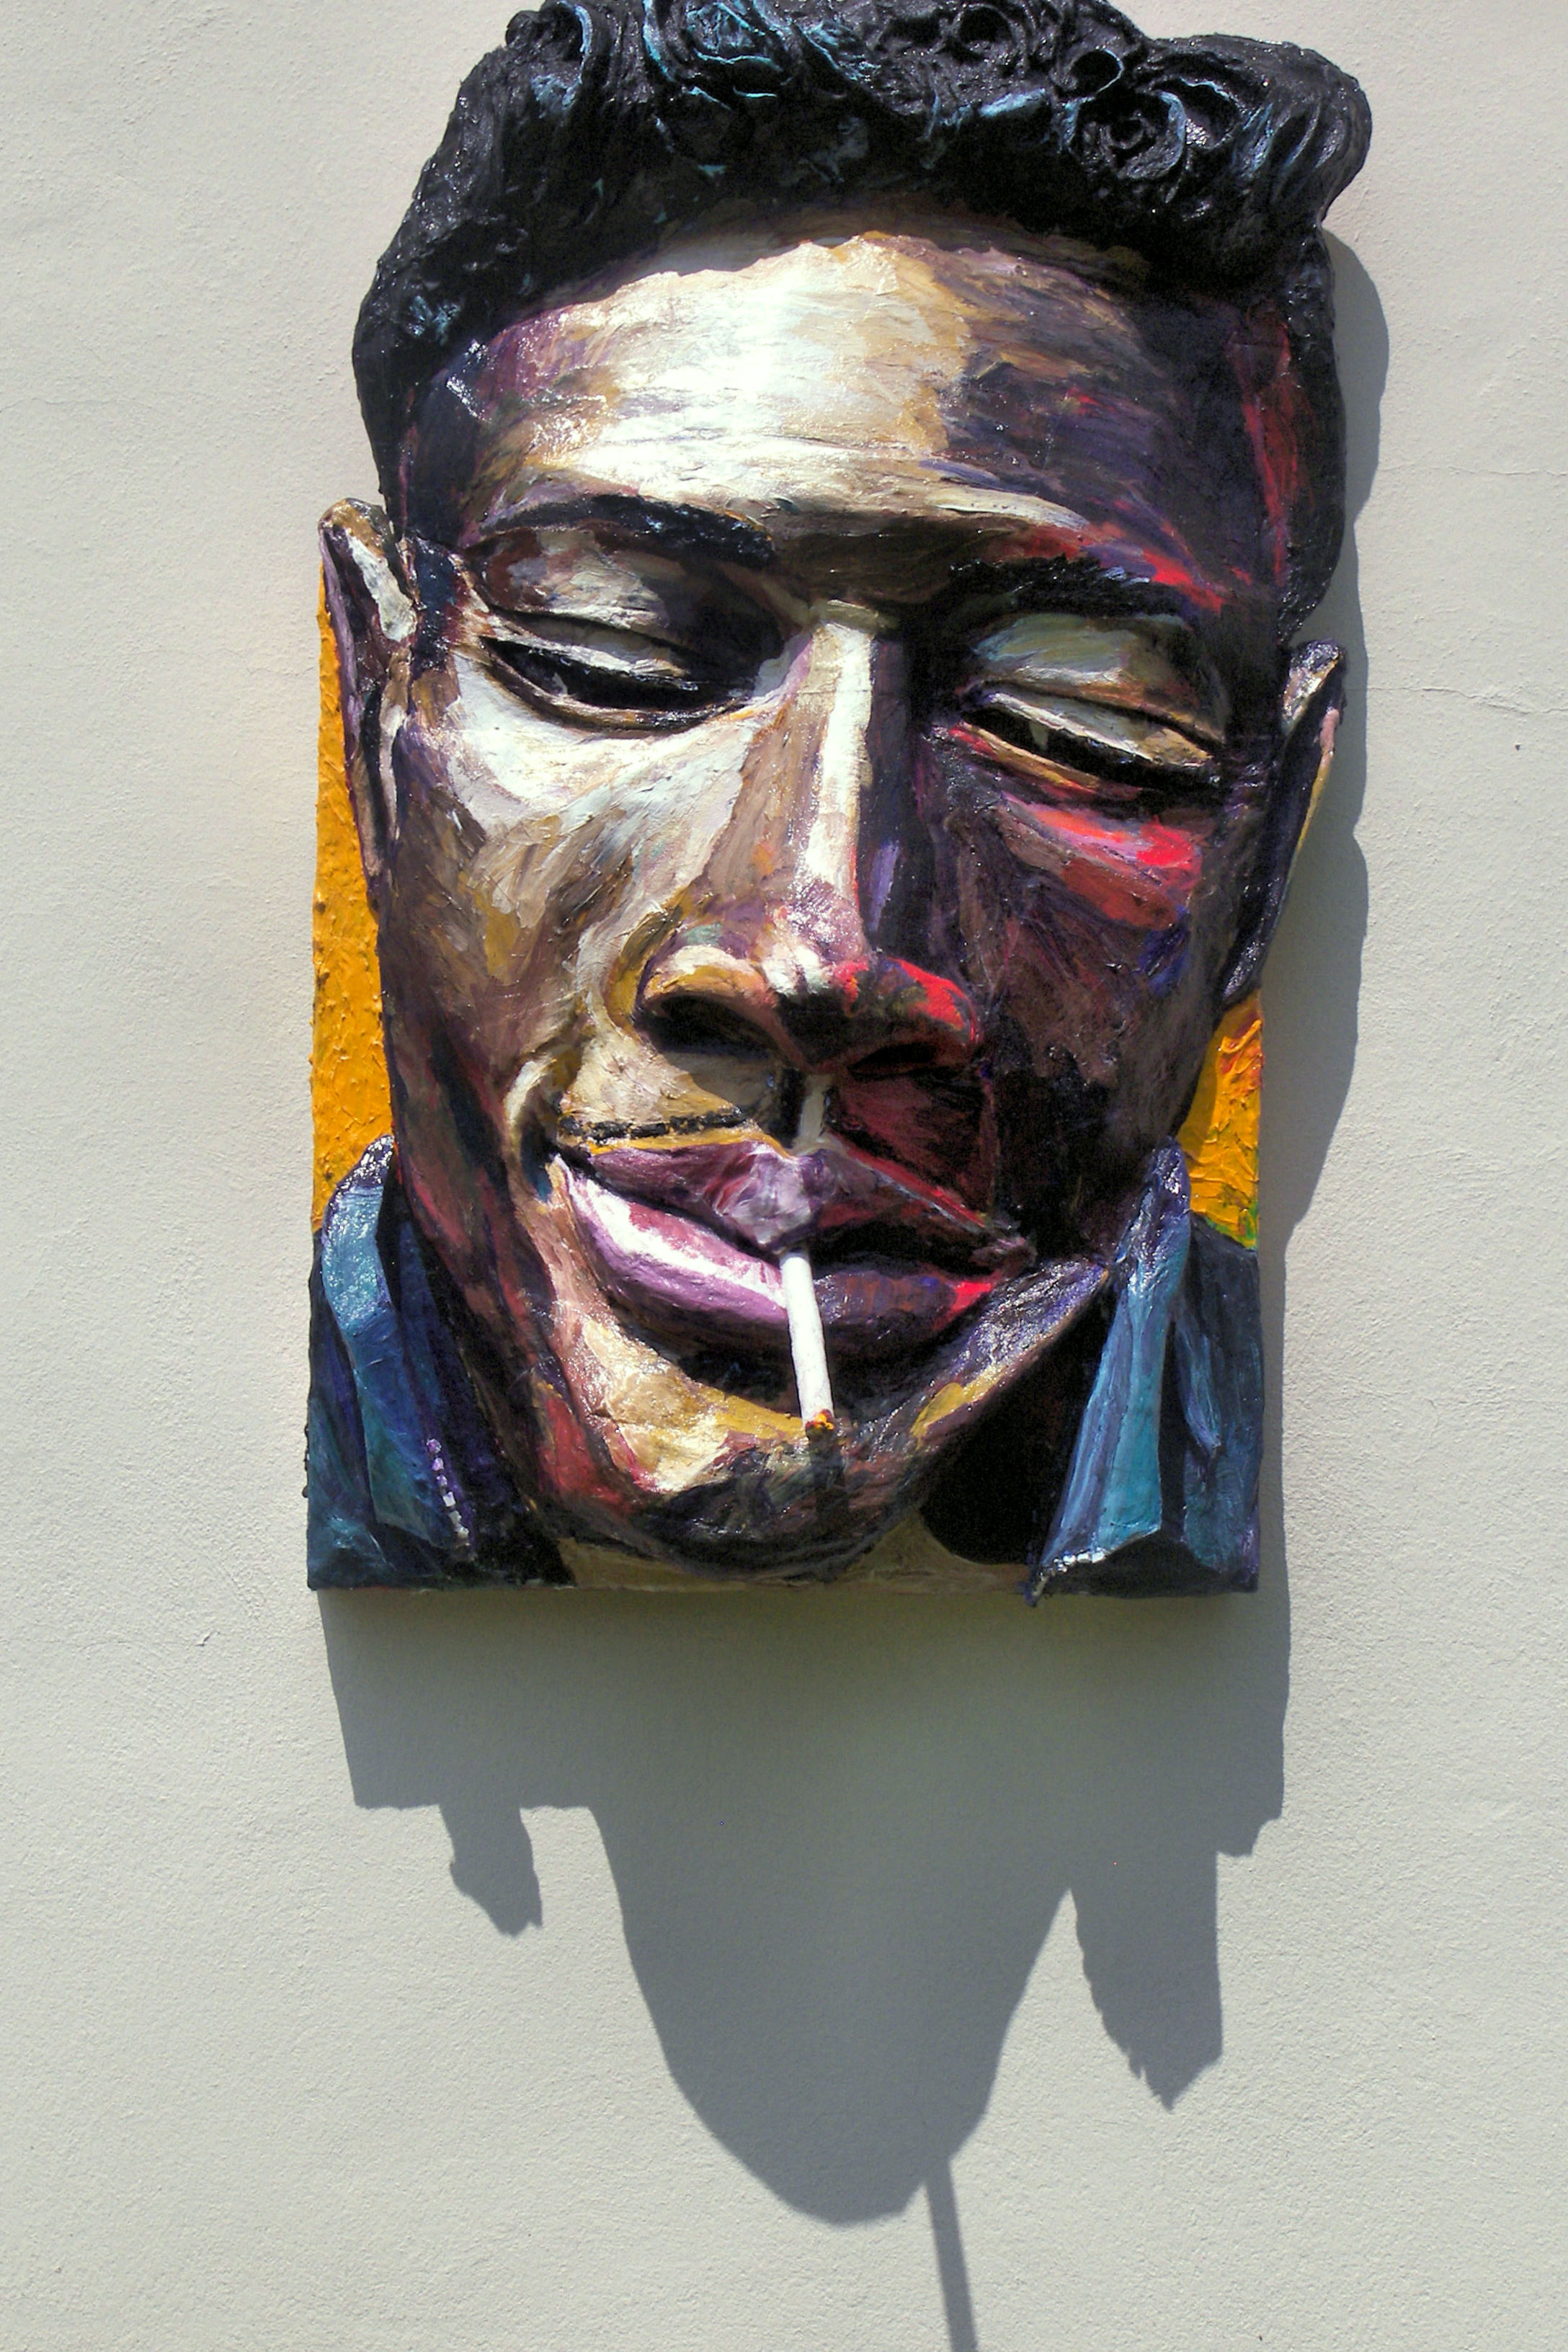 Built-Out Portrait of Junior Wells by Artist Brett Stuart Wilson